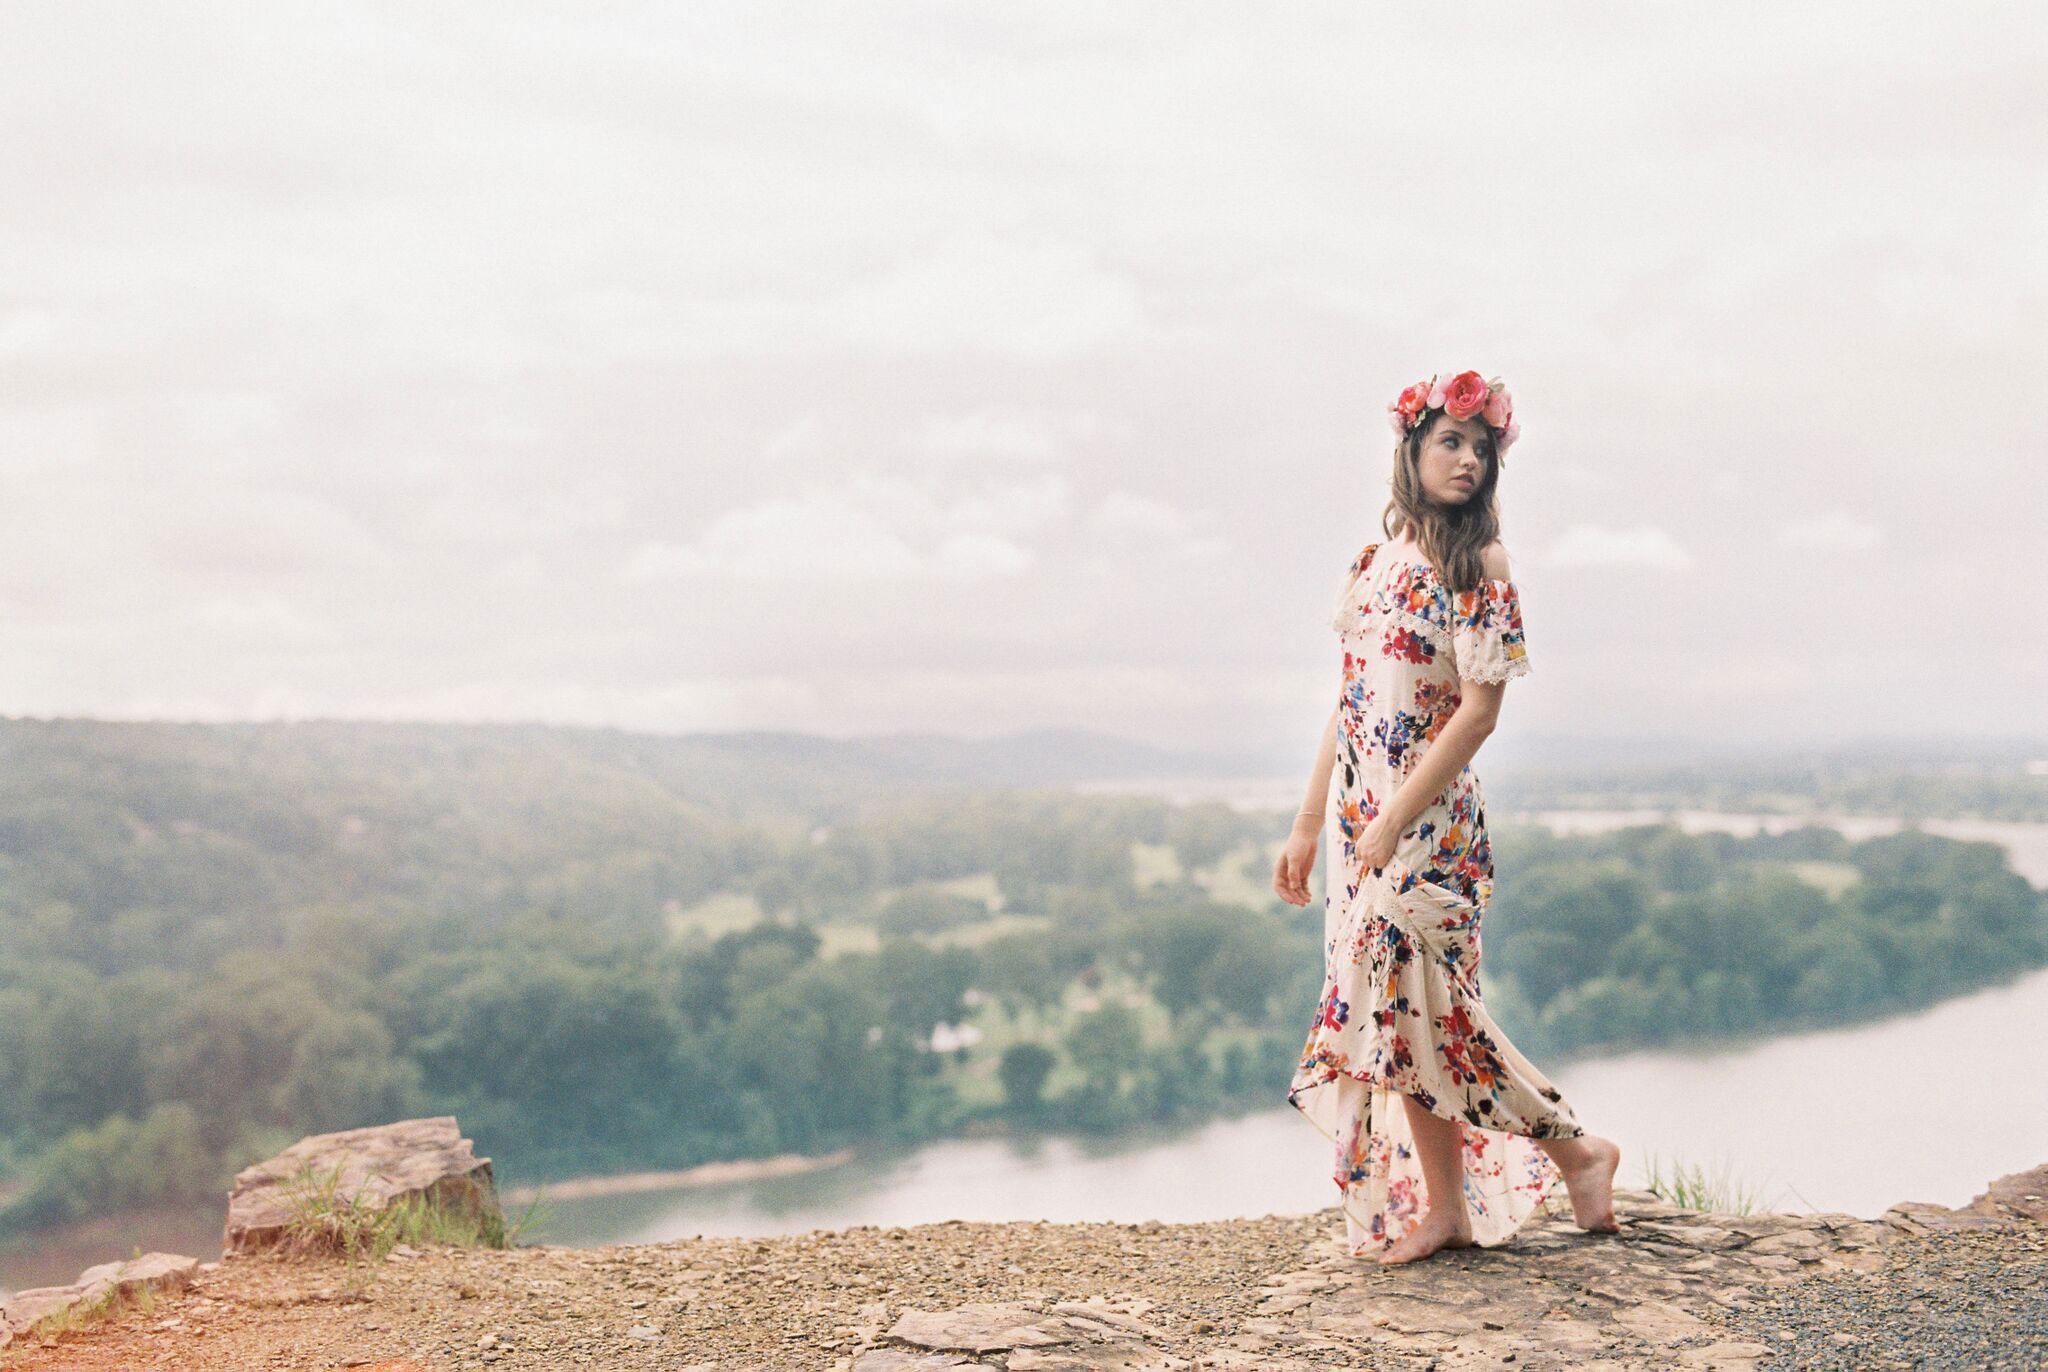 Arkansas Senior Portraits by Arin Photography